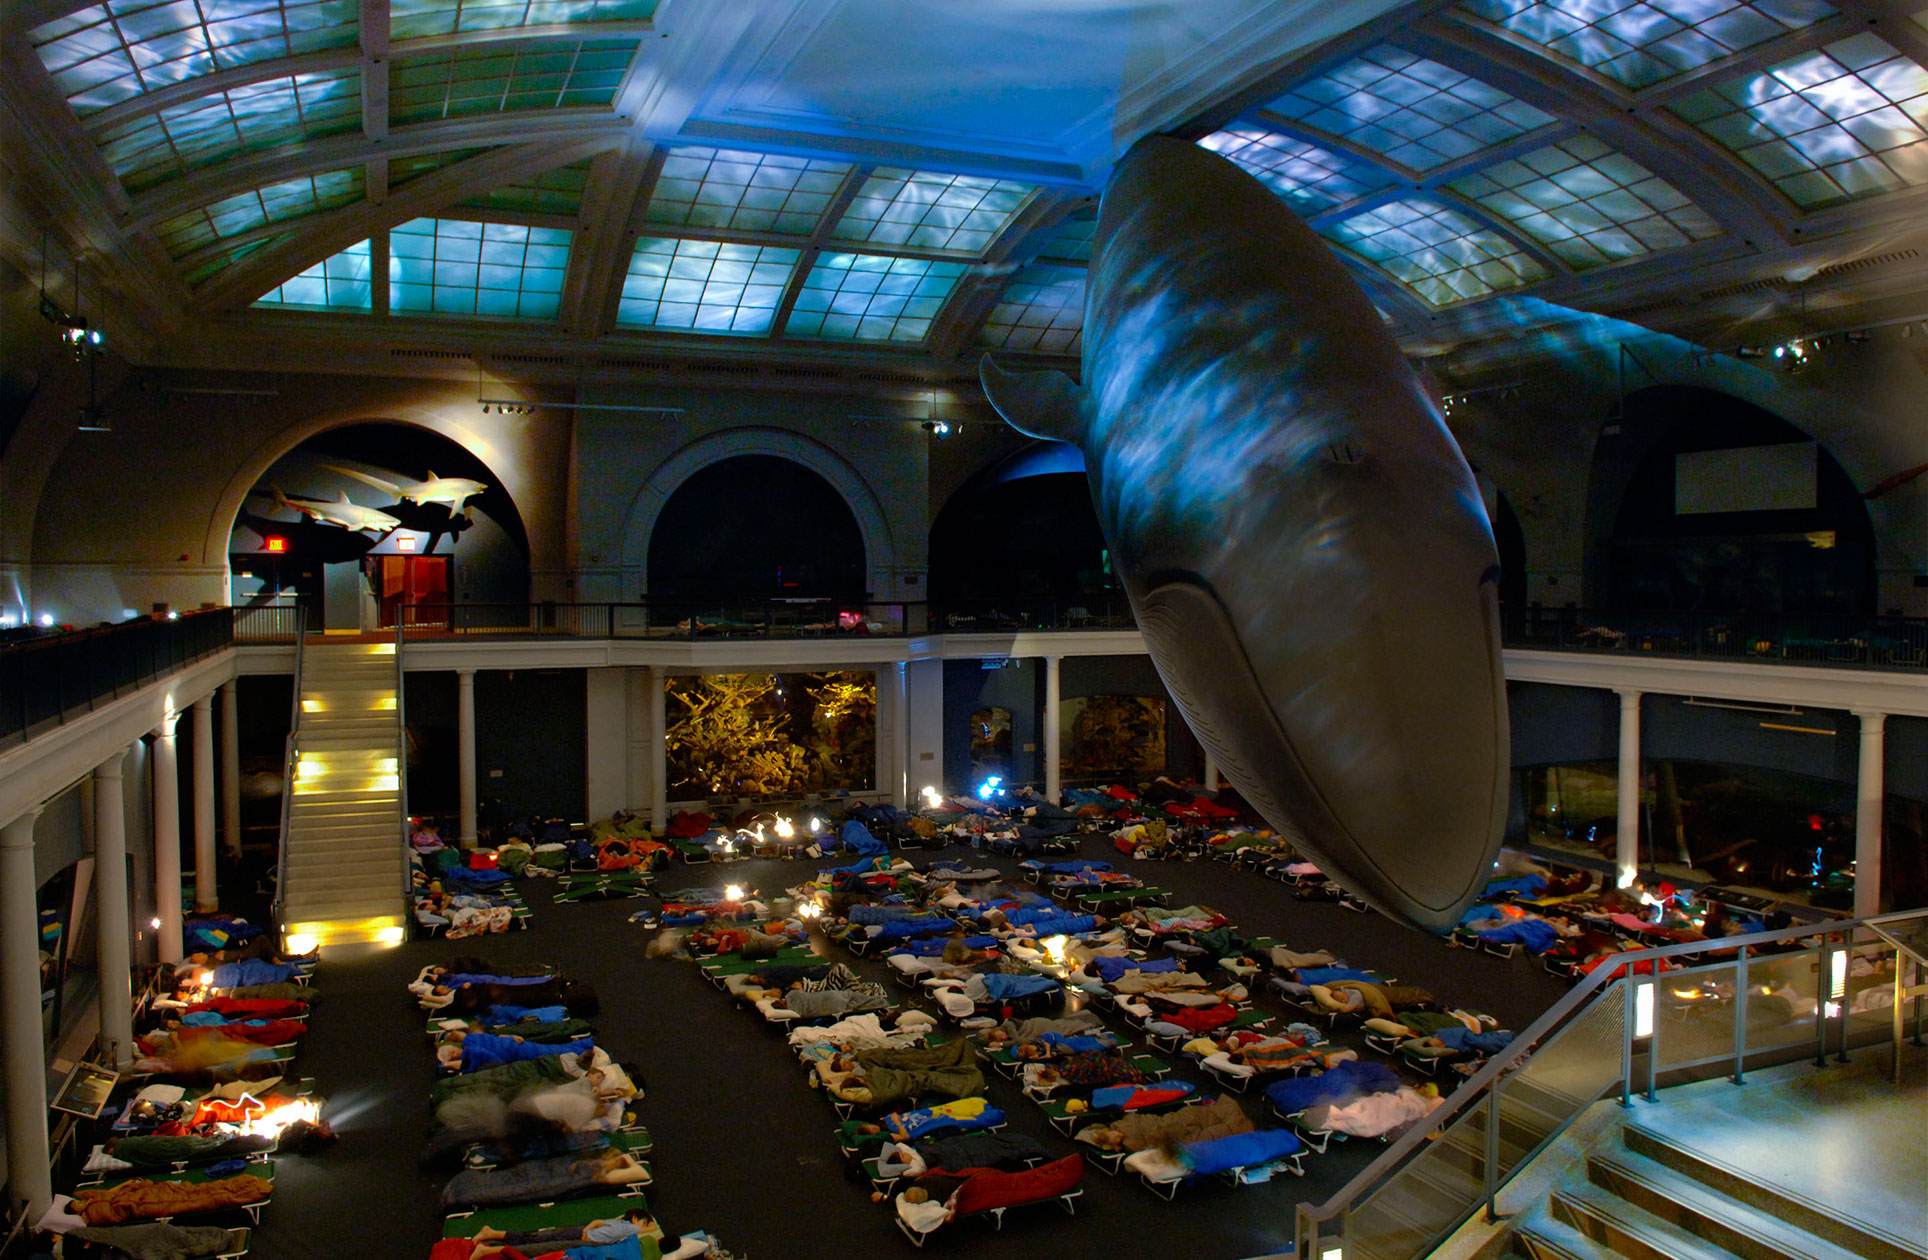 Night at the Museum Sleepover